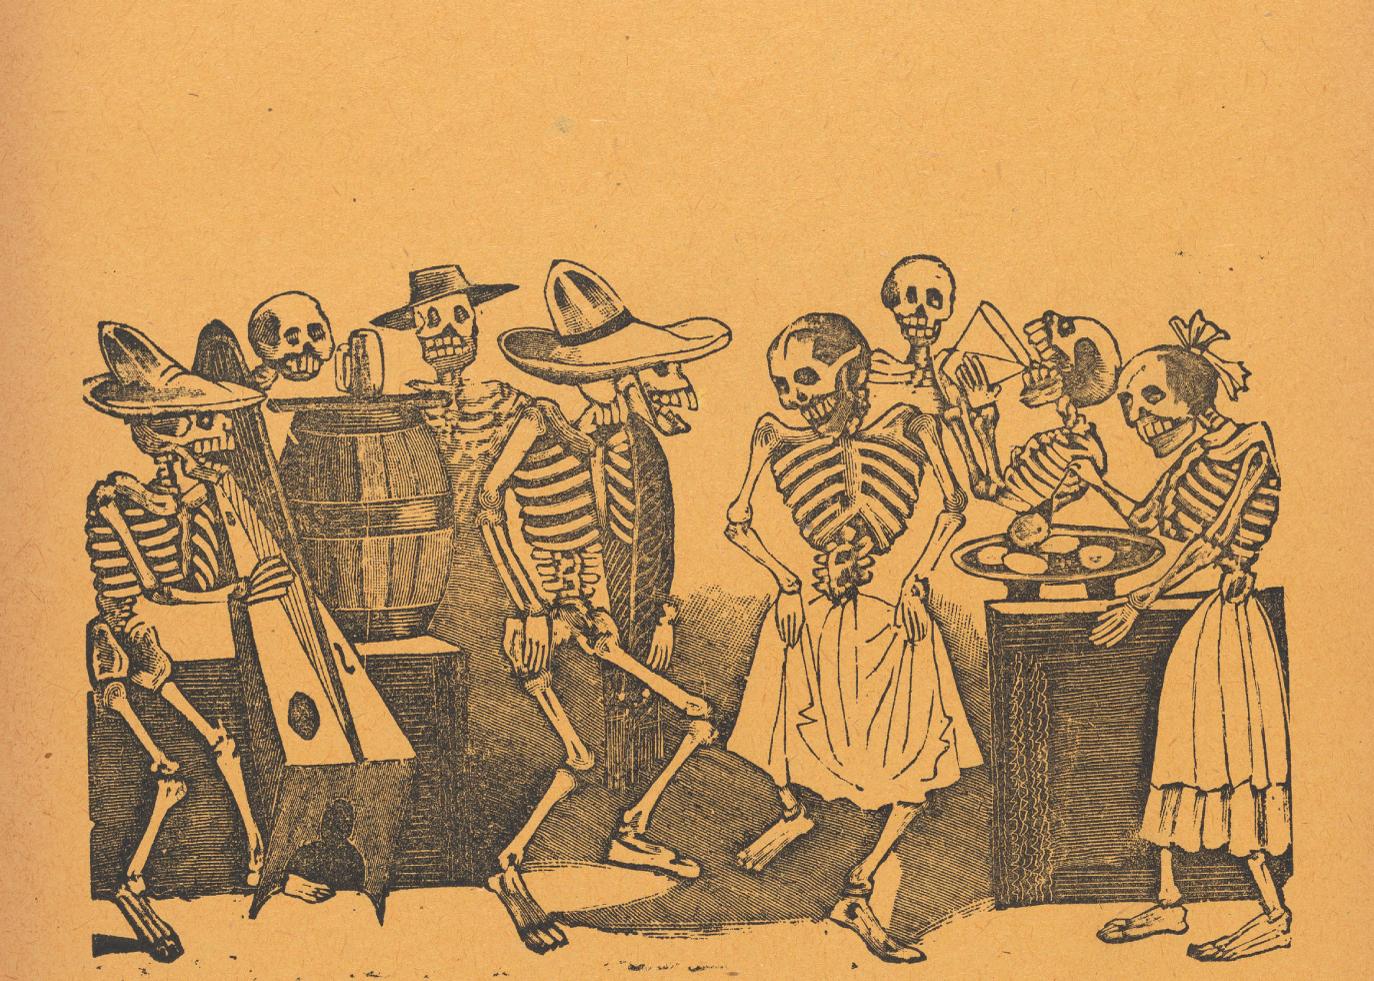 danse-macabre-article-banner.jpg